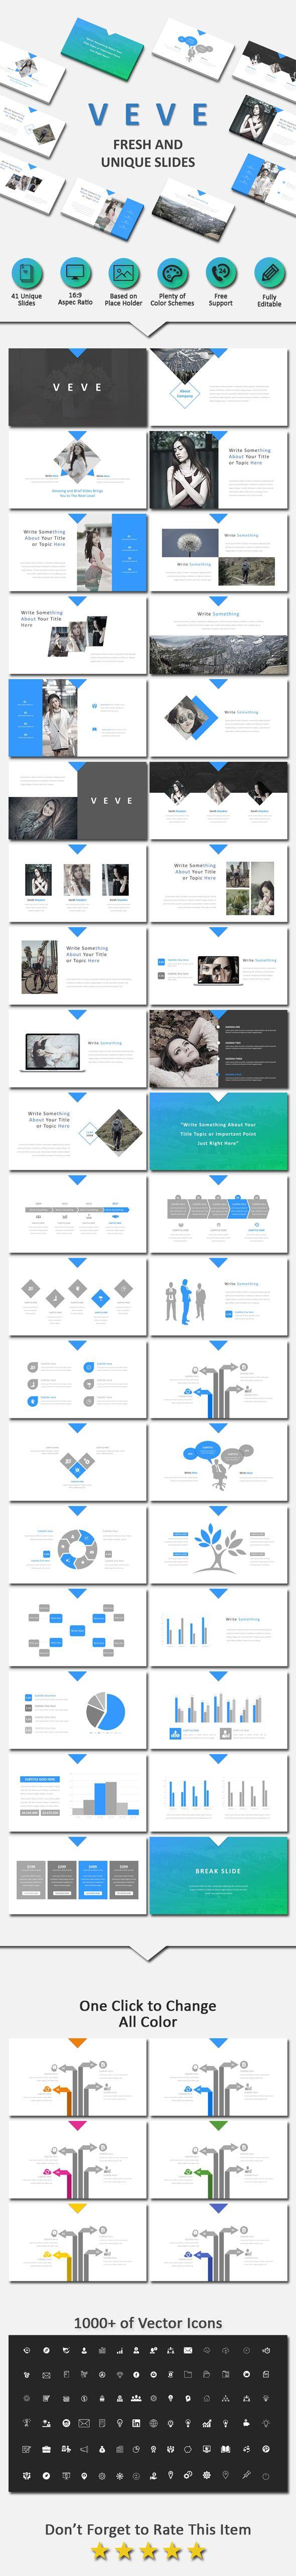 Veve - Creative Powerpoint Template